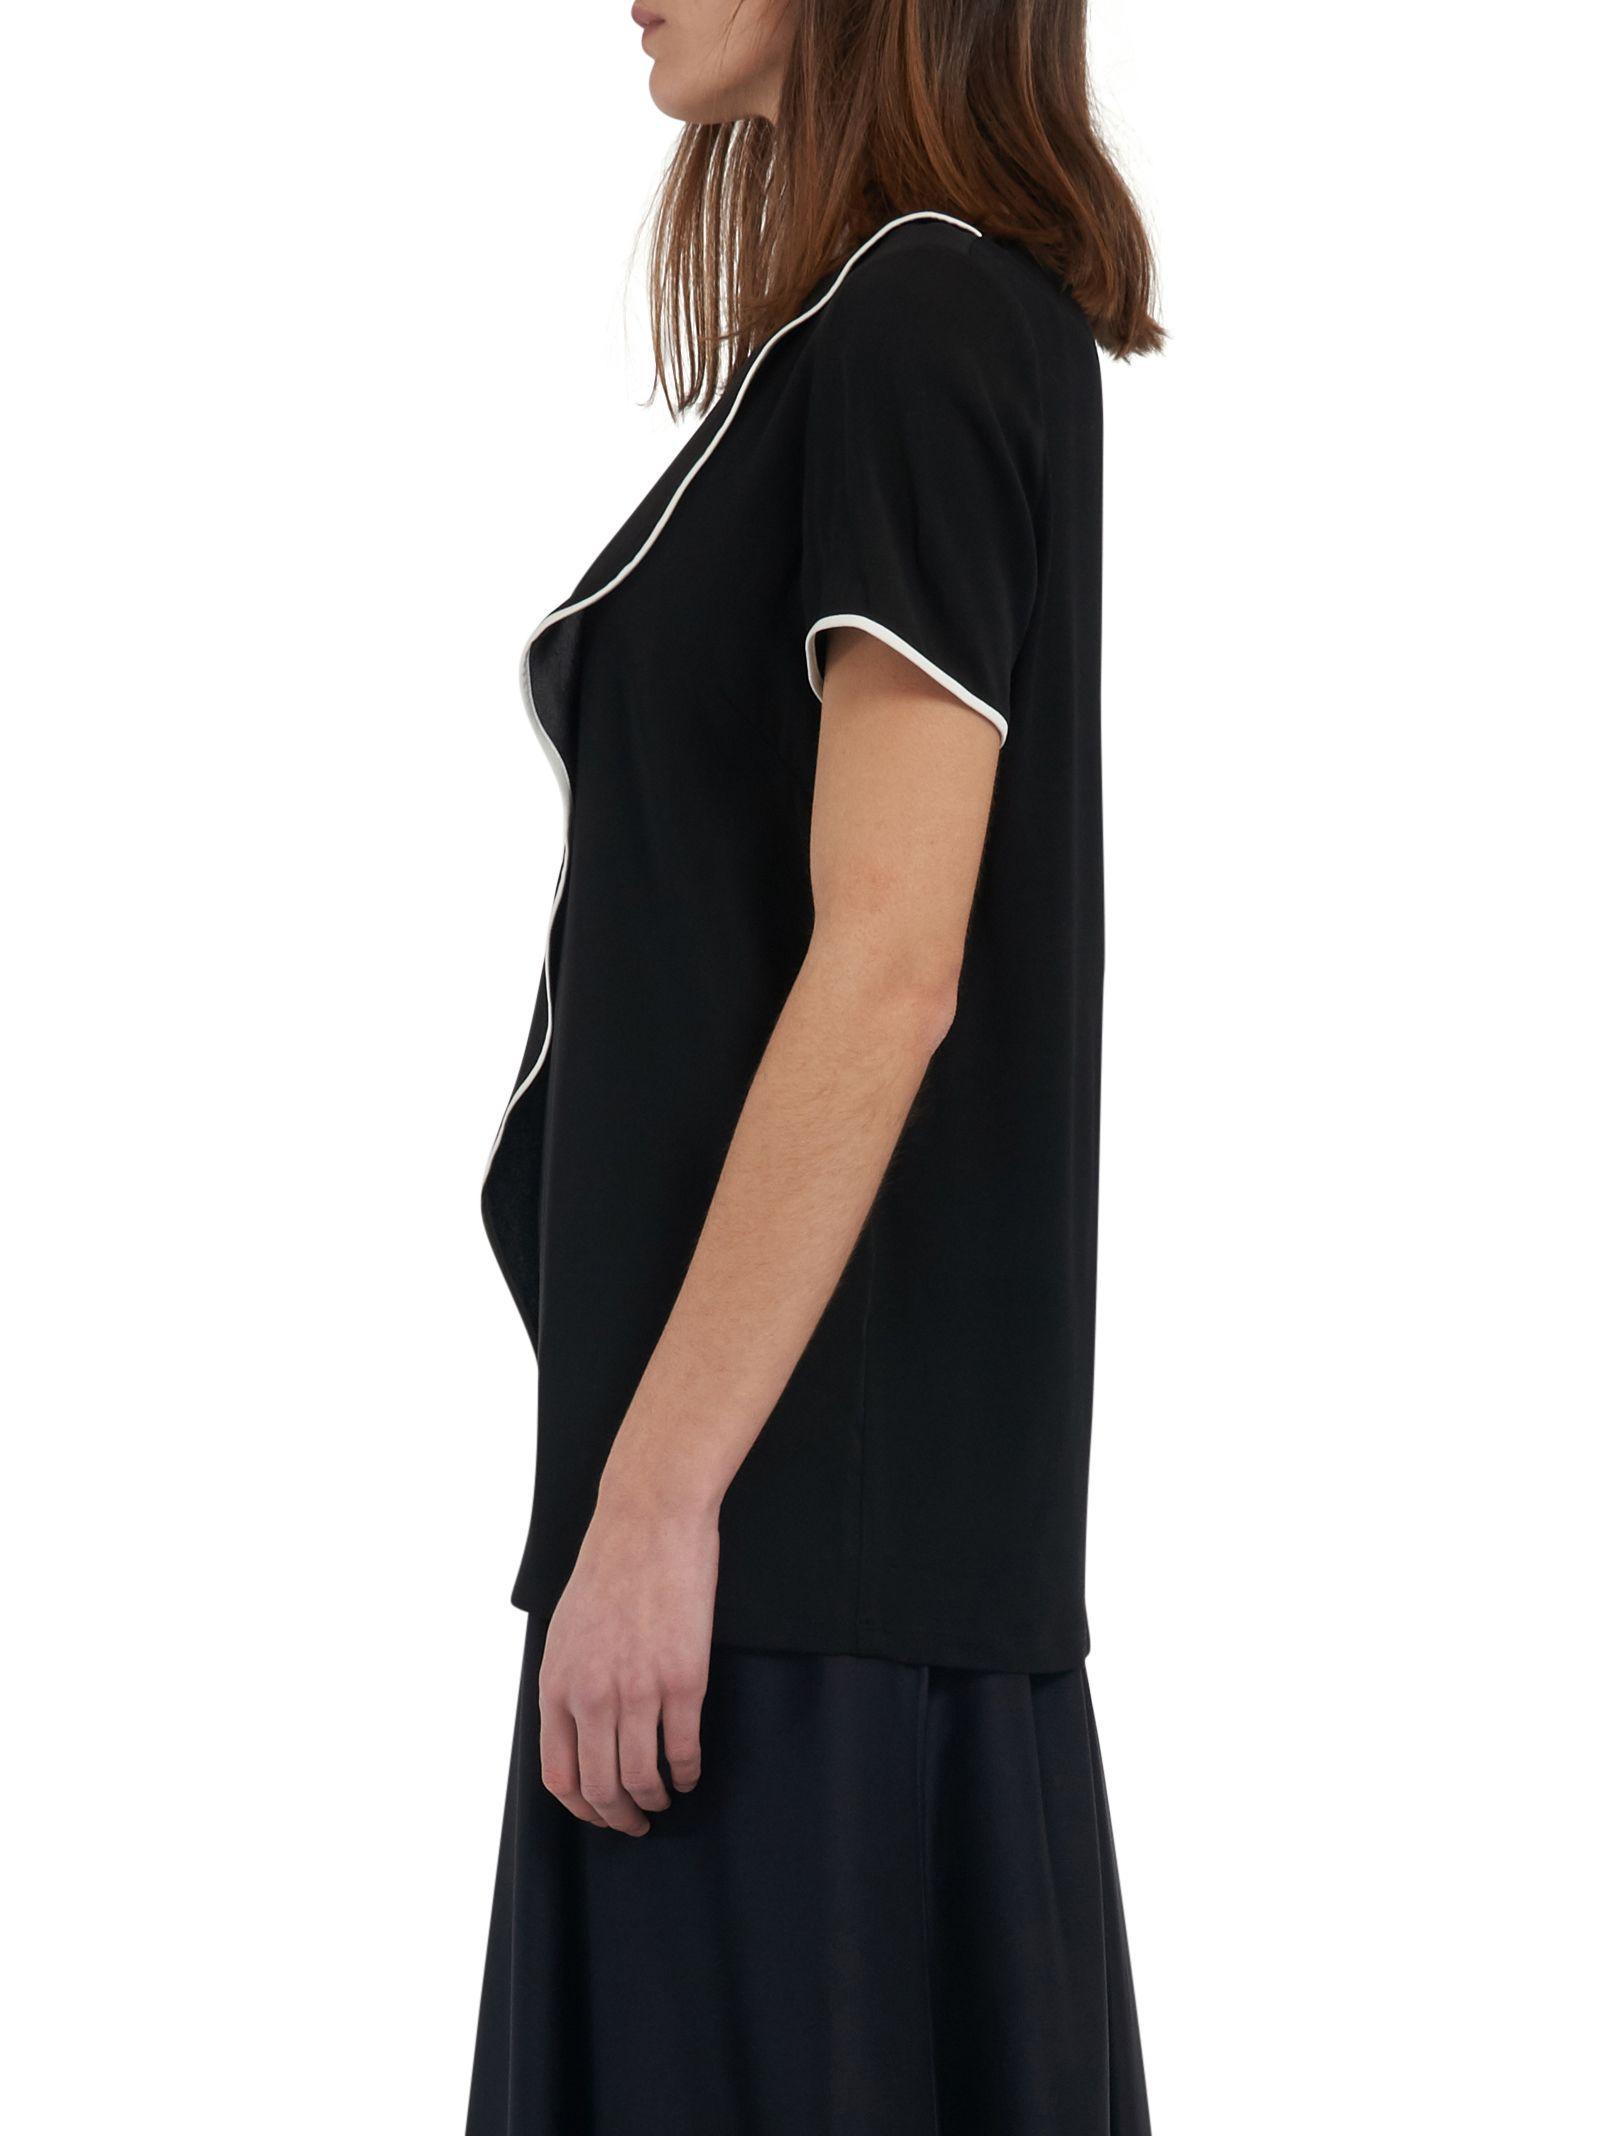 Max Mara Maxmara Primavera Blouse In Black